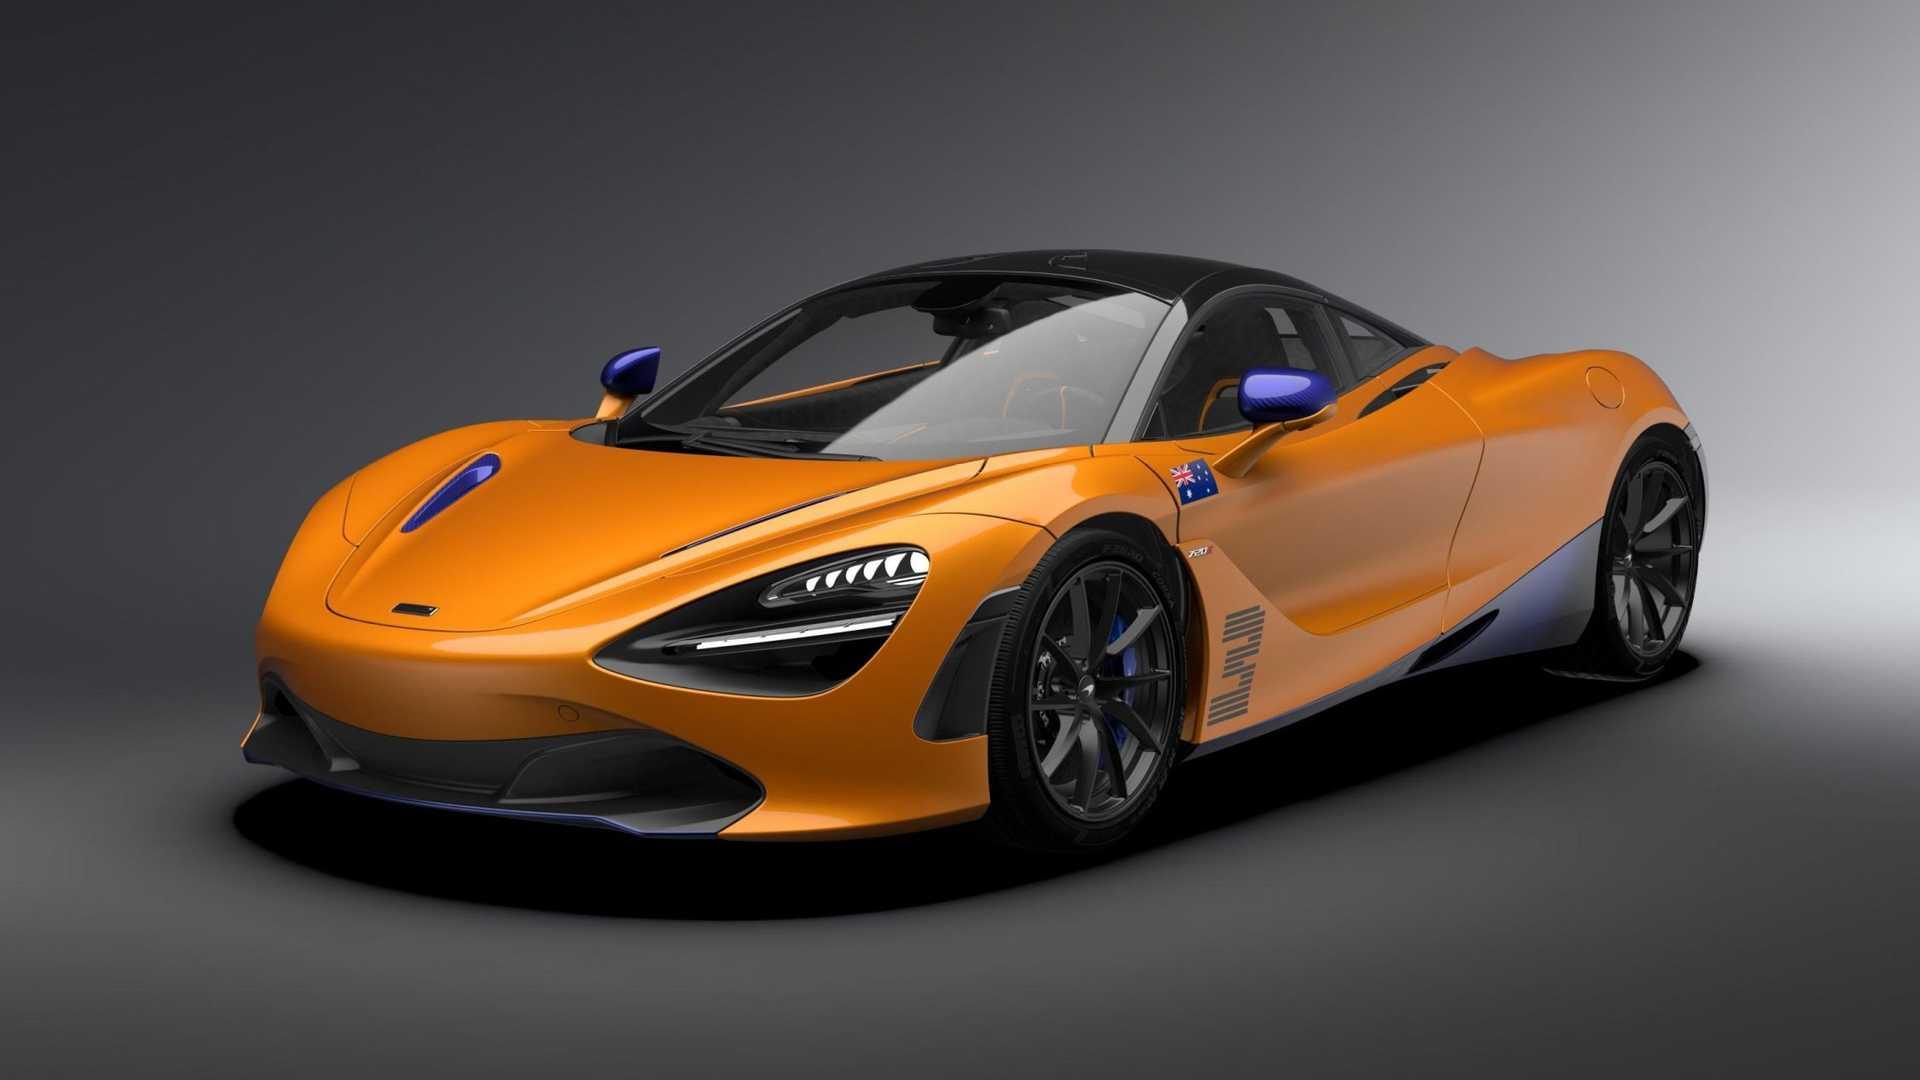 McLaren-720S-Daniel-Ricciardo-Edition-3